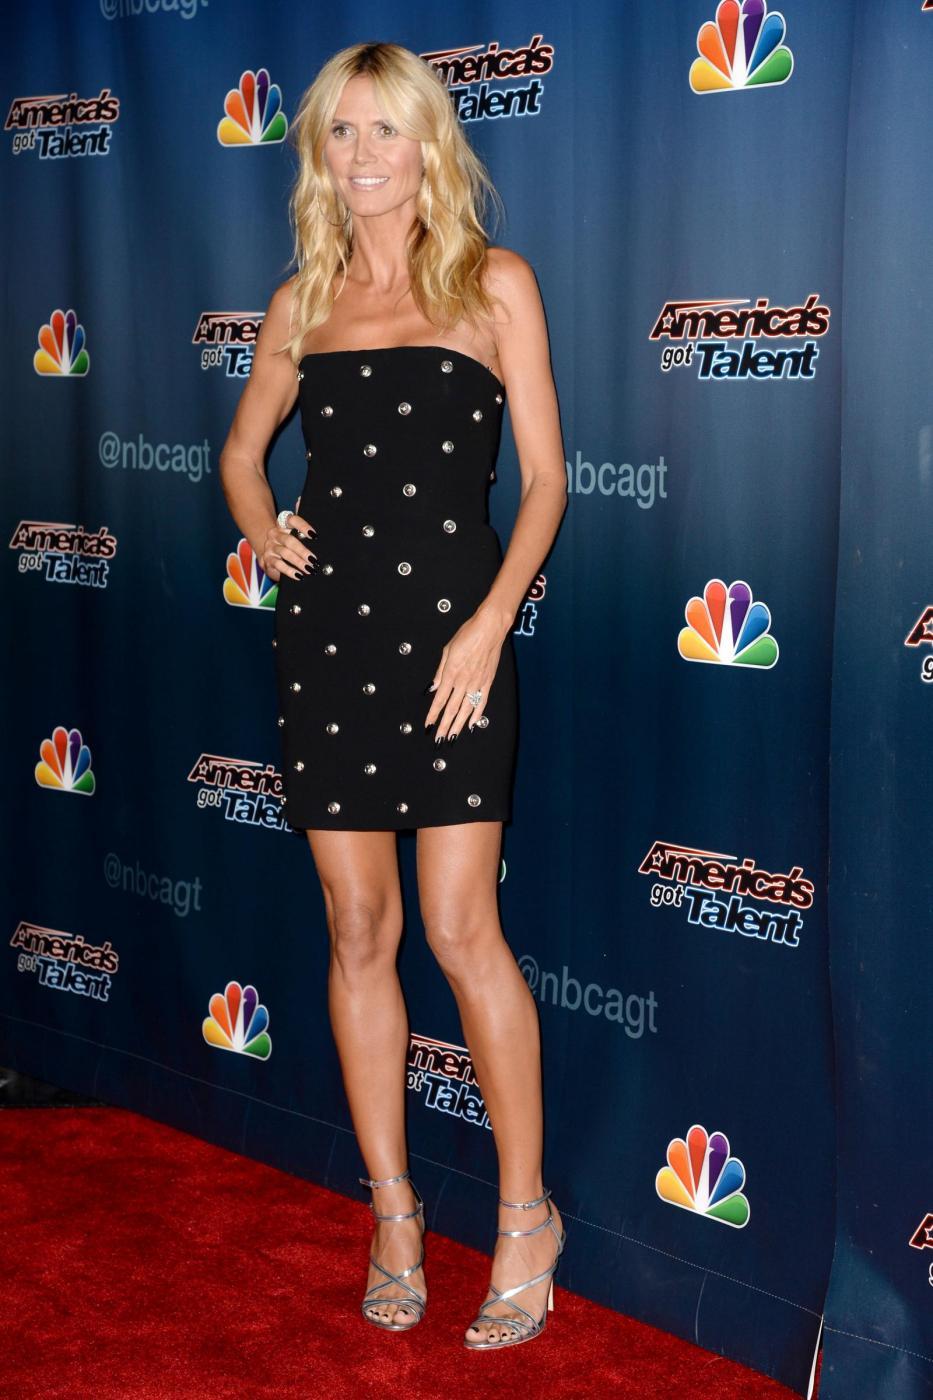 Heidi Klum, mini abito e tacchi per America's Got Talent 10